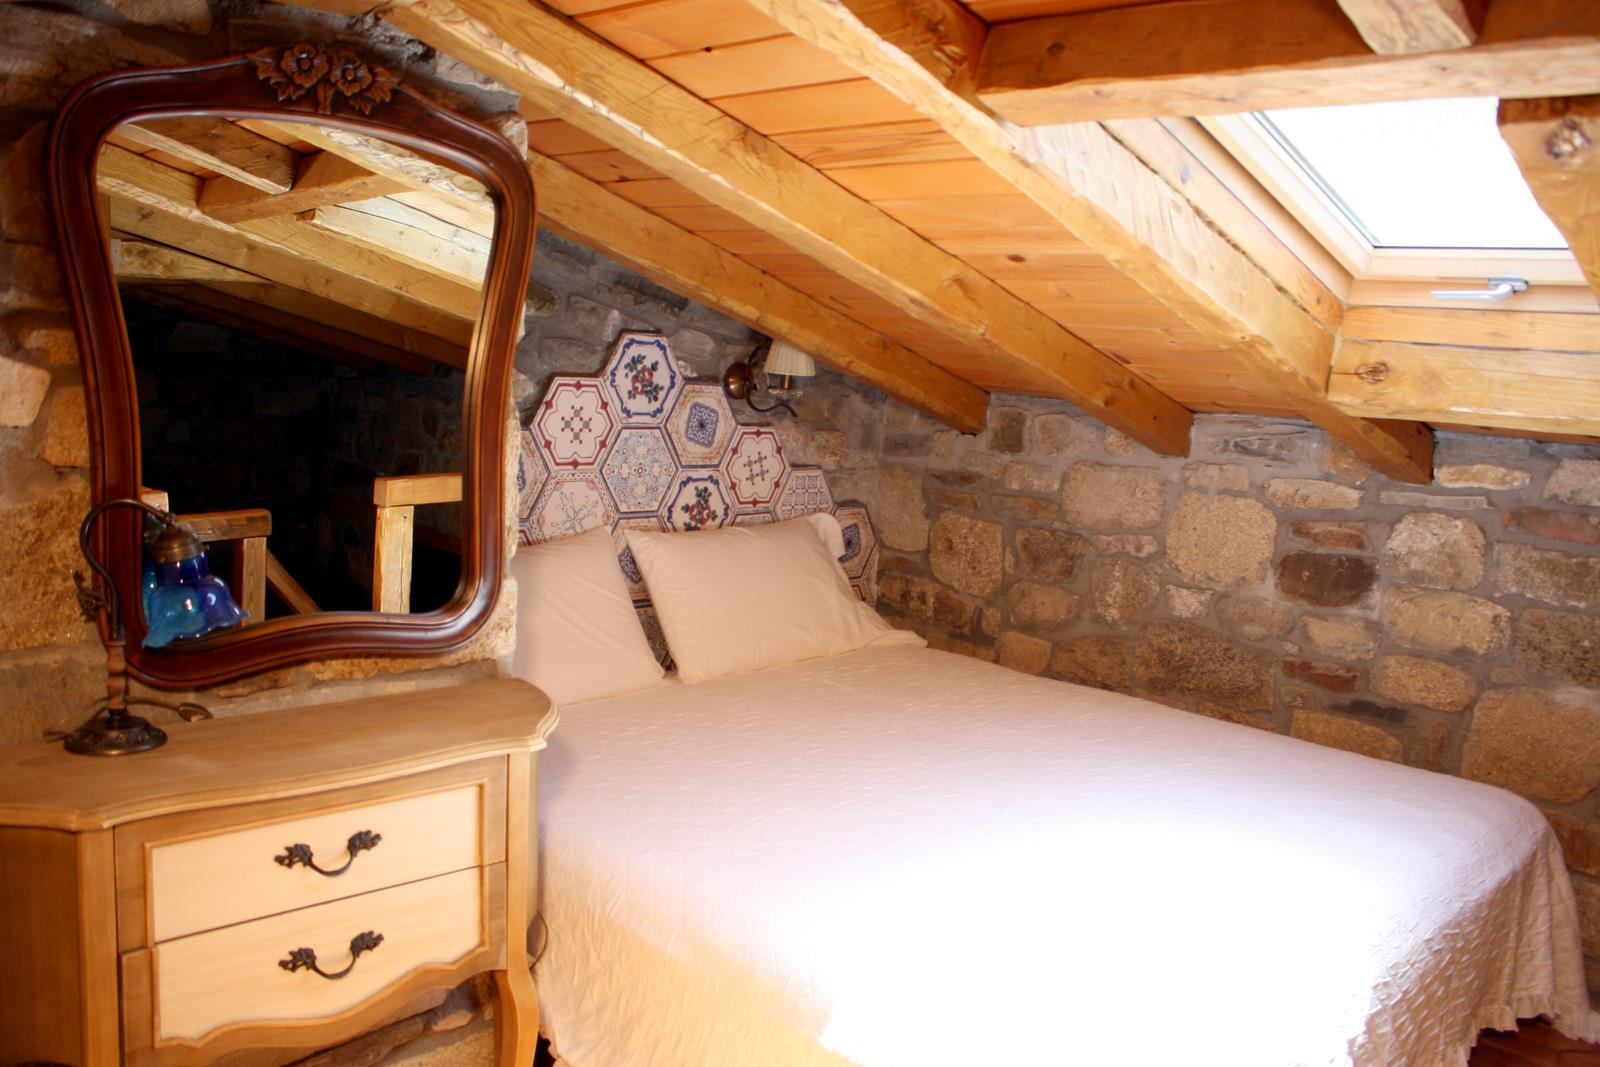 halkidiki vourvourou accommodation - Ta Petrina Vourvourou Halkidiki